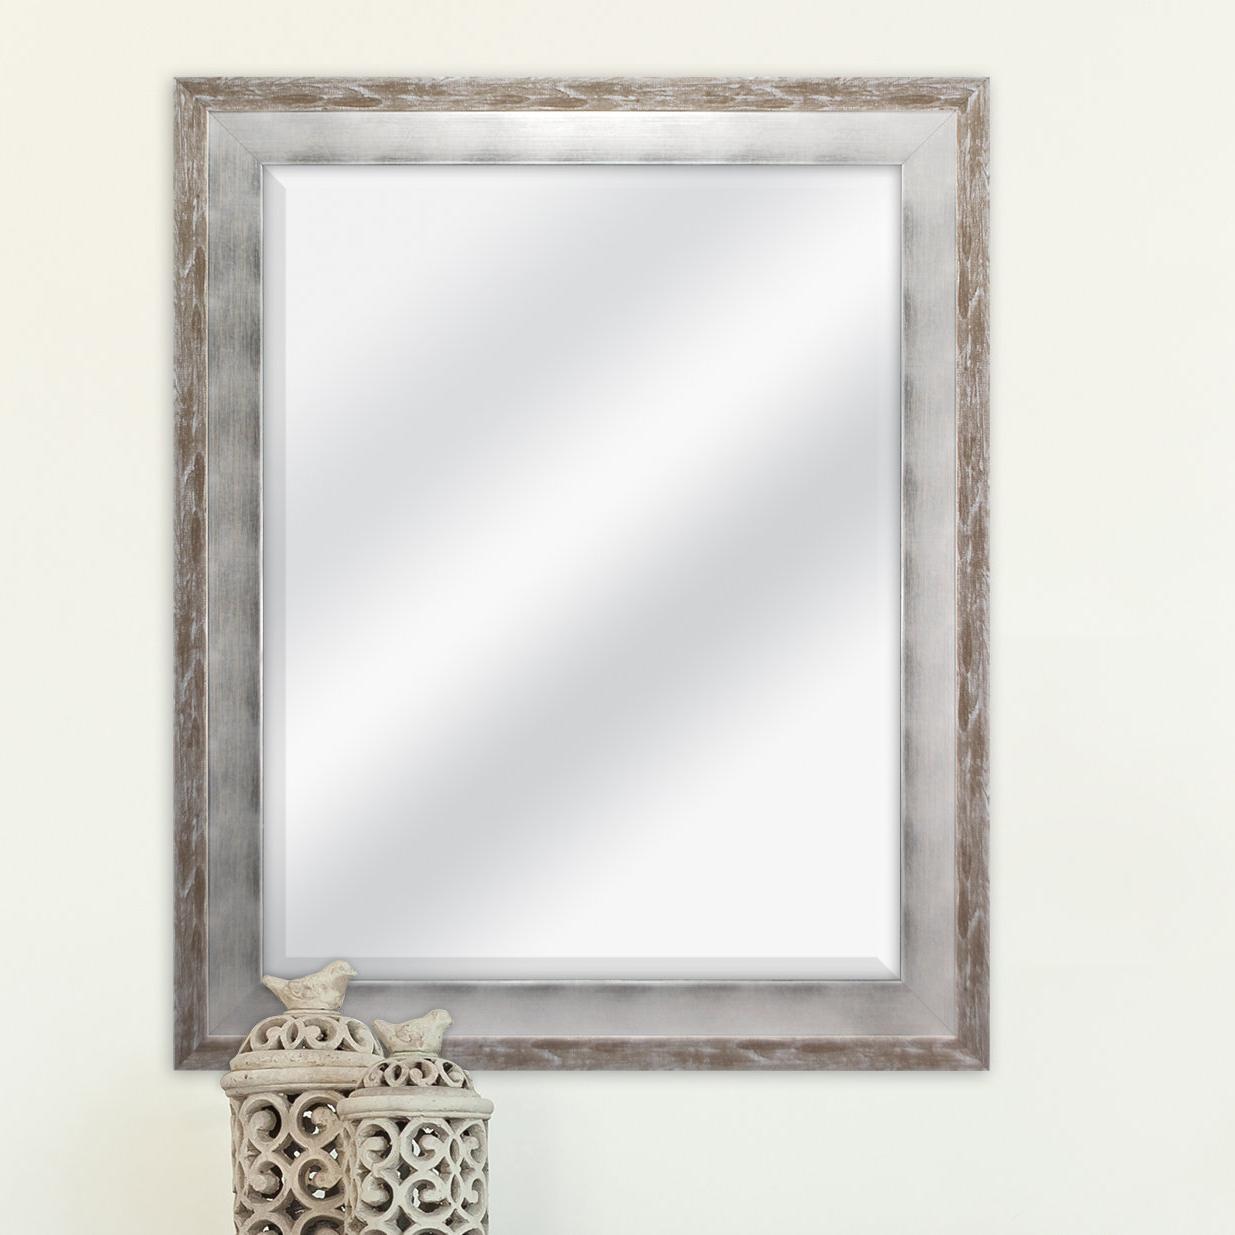 2020 Epinal Shabby Elegance Wall Mirrors Pertaining To Epinal Shabby Elegance Wall Mirror (View 2 of 20)